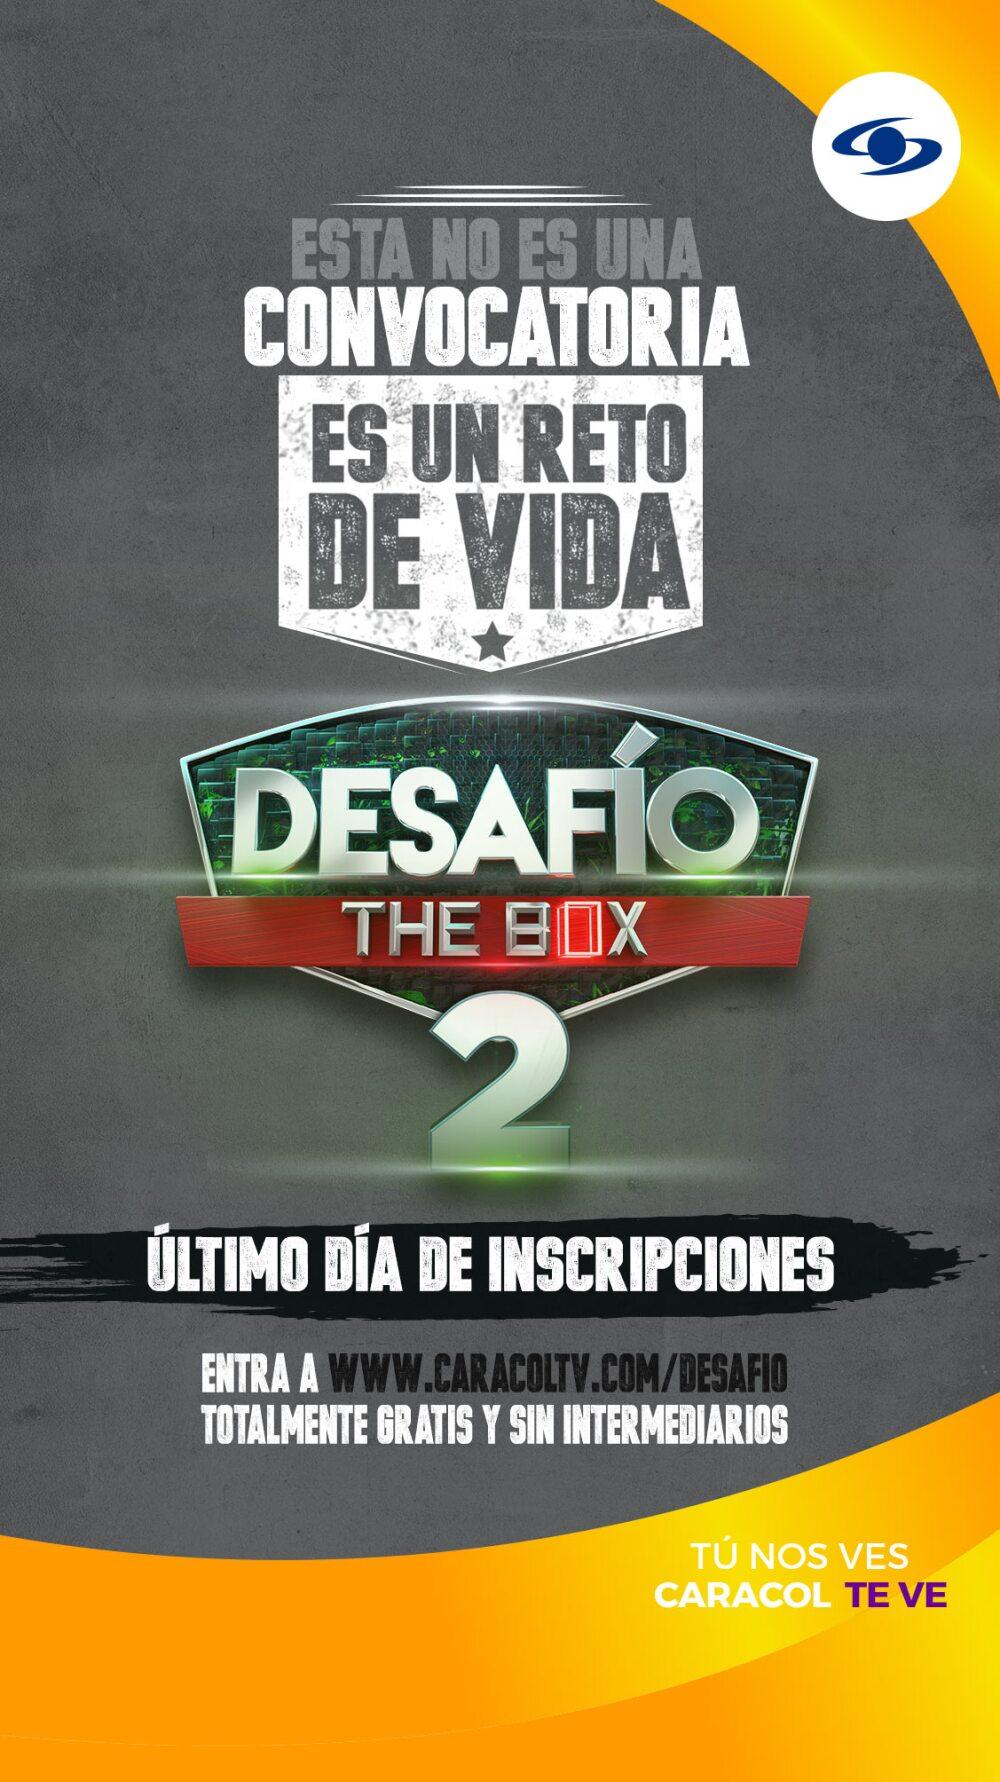 Desafio_the_box_2_IG_Story_1127x2008_ultimos_dias.jpg